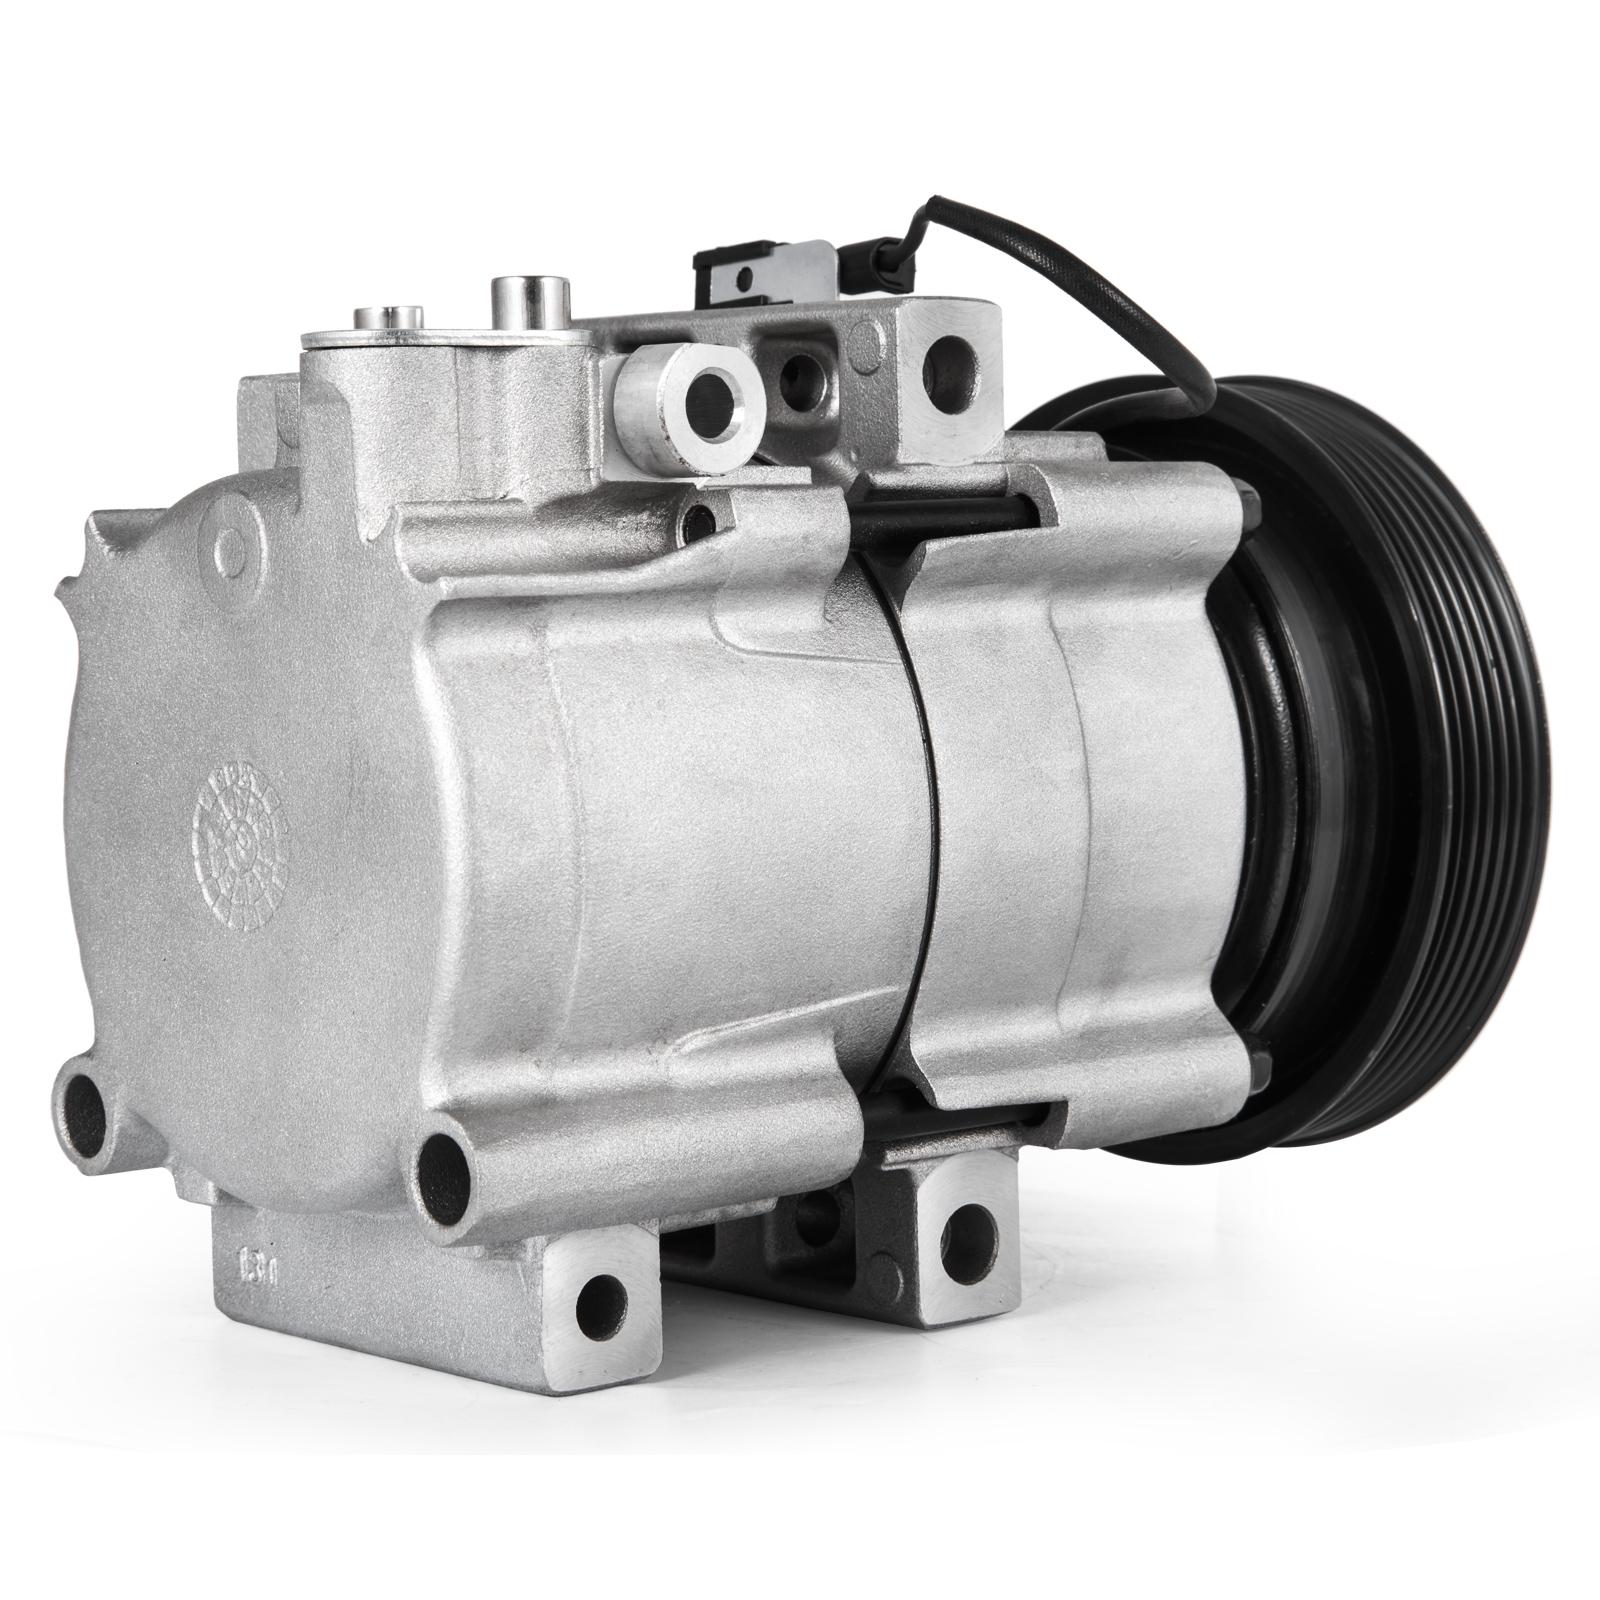 A//C Compressor Kit Fits Hyundai Santa Fe 2001-2006 2.7L OEM HS18 57183